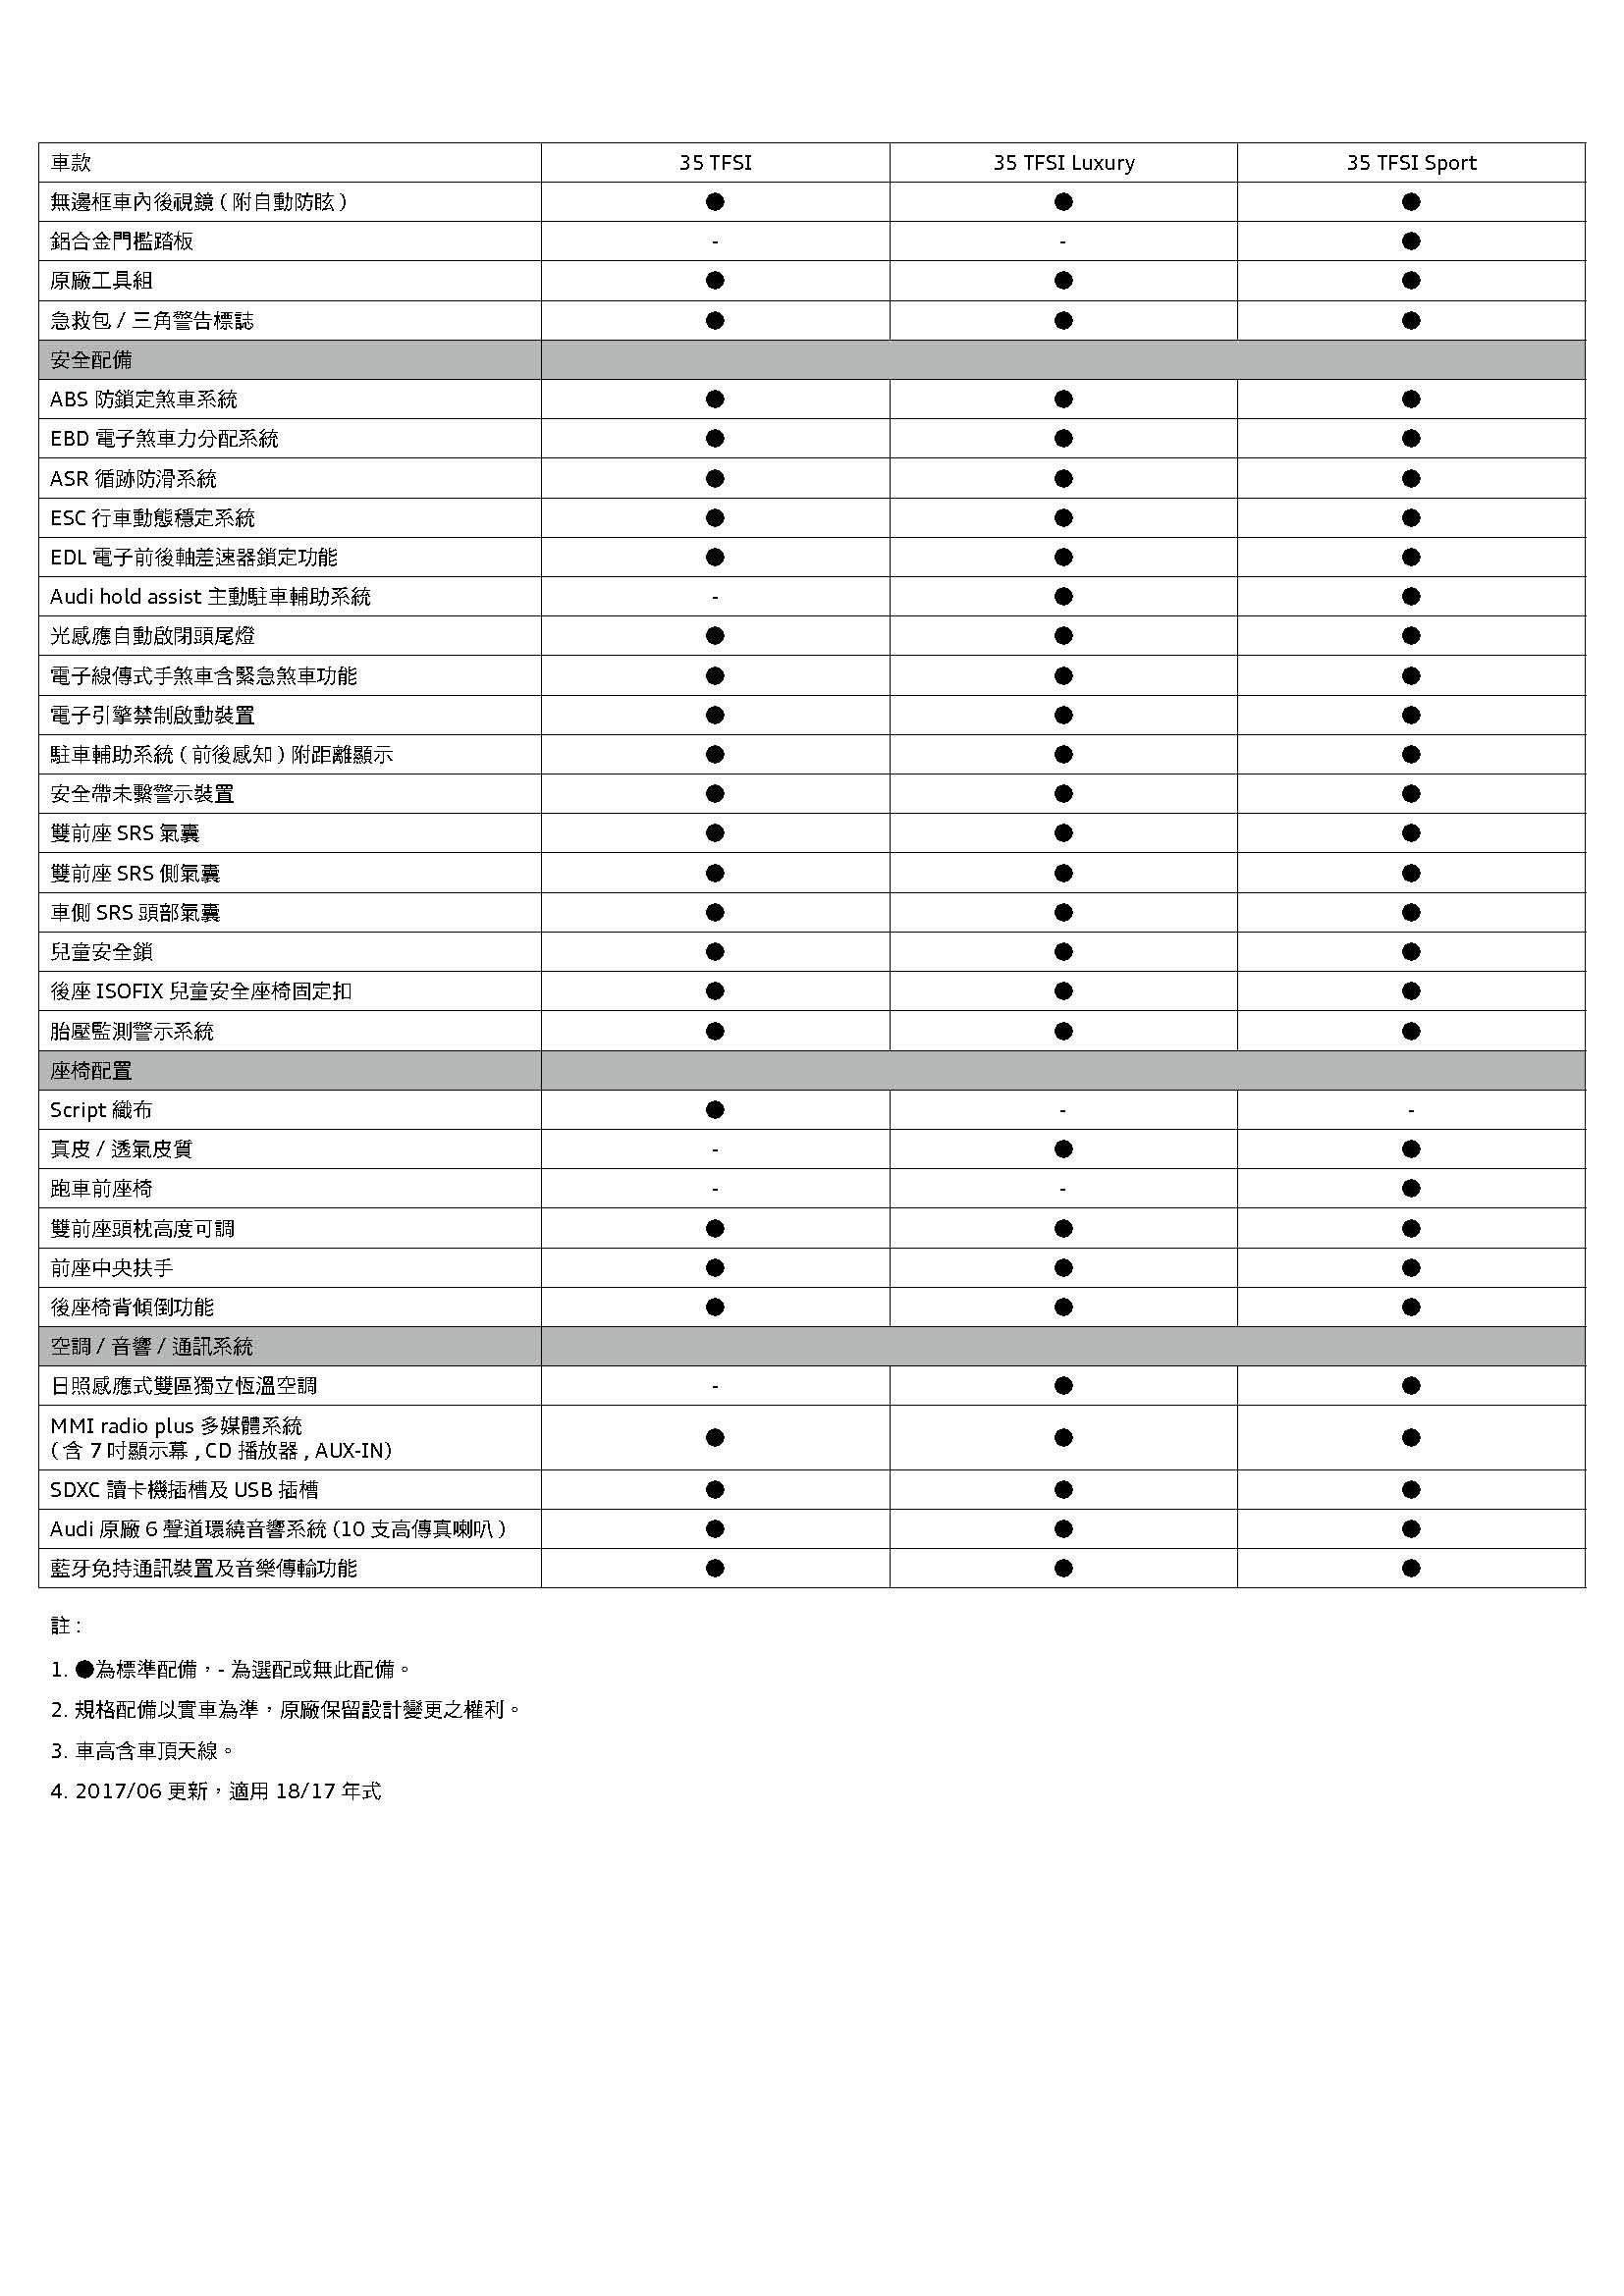 Audi Q2規配表_頁面_2